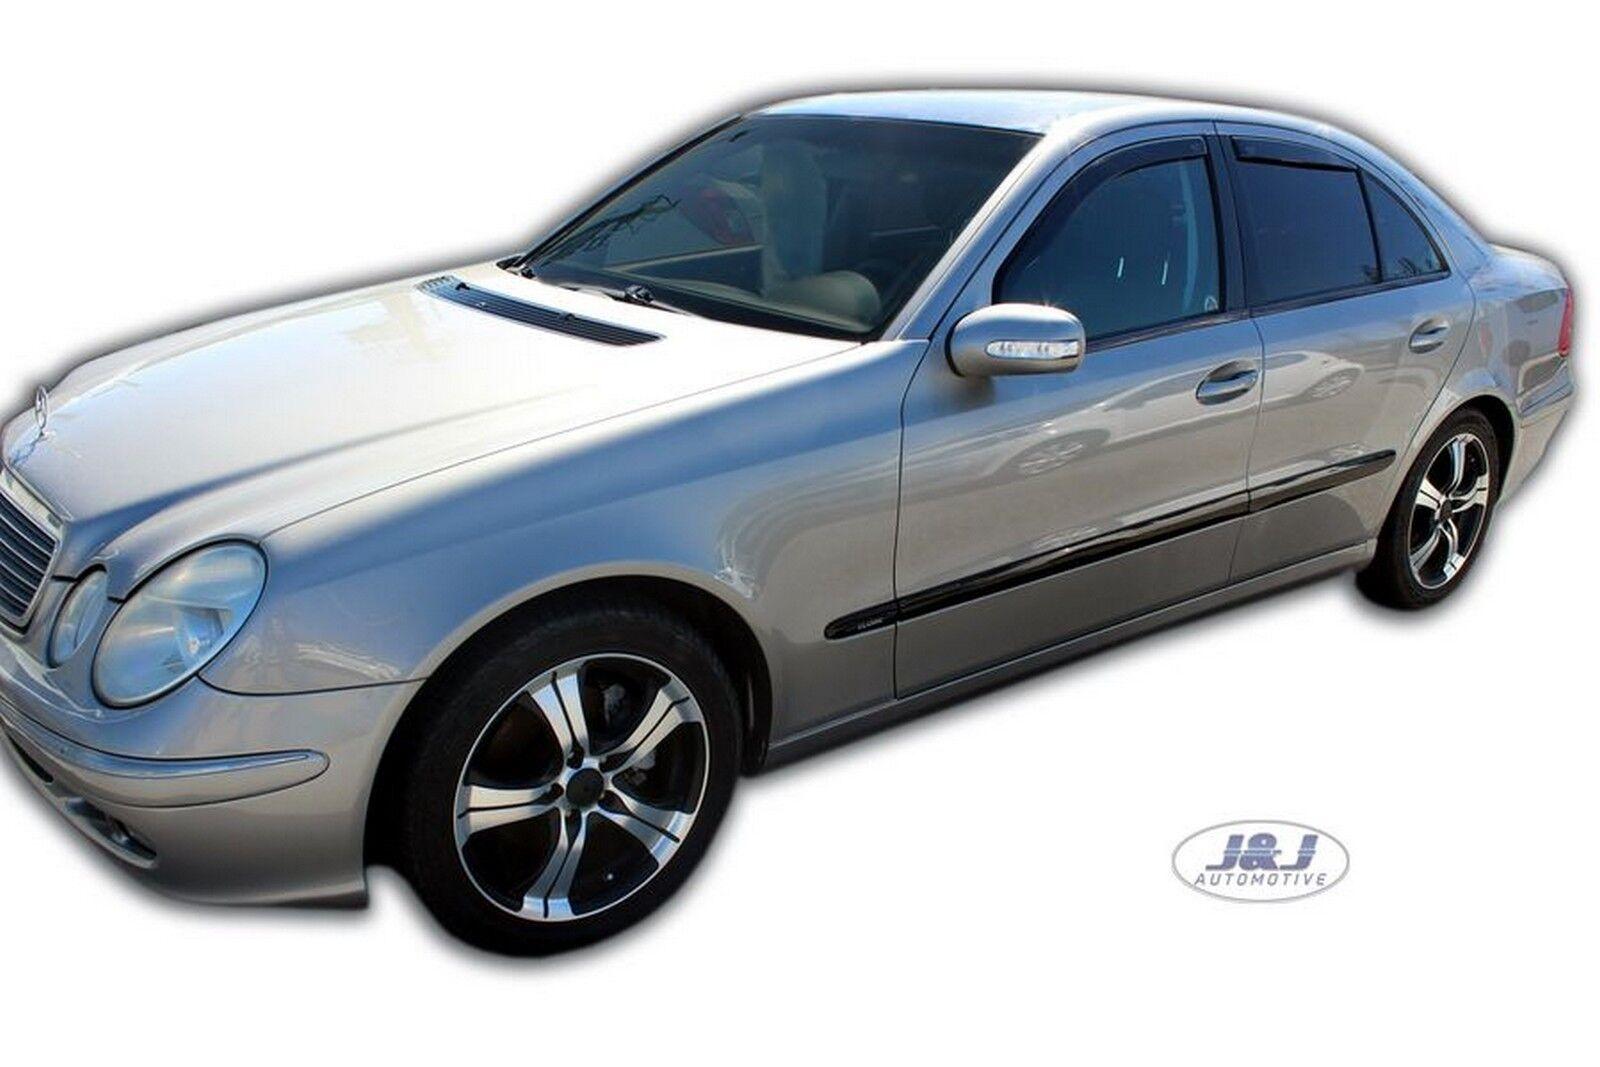 Wind Deflectors Compatible With Mercedes E Class W211 5 Doors Estate 4pc Vehicle Parts Accessories Car Parts